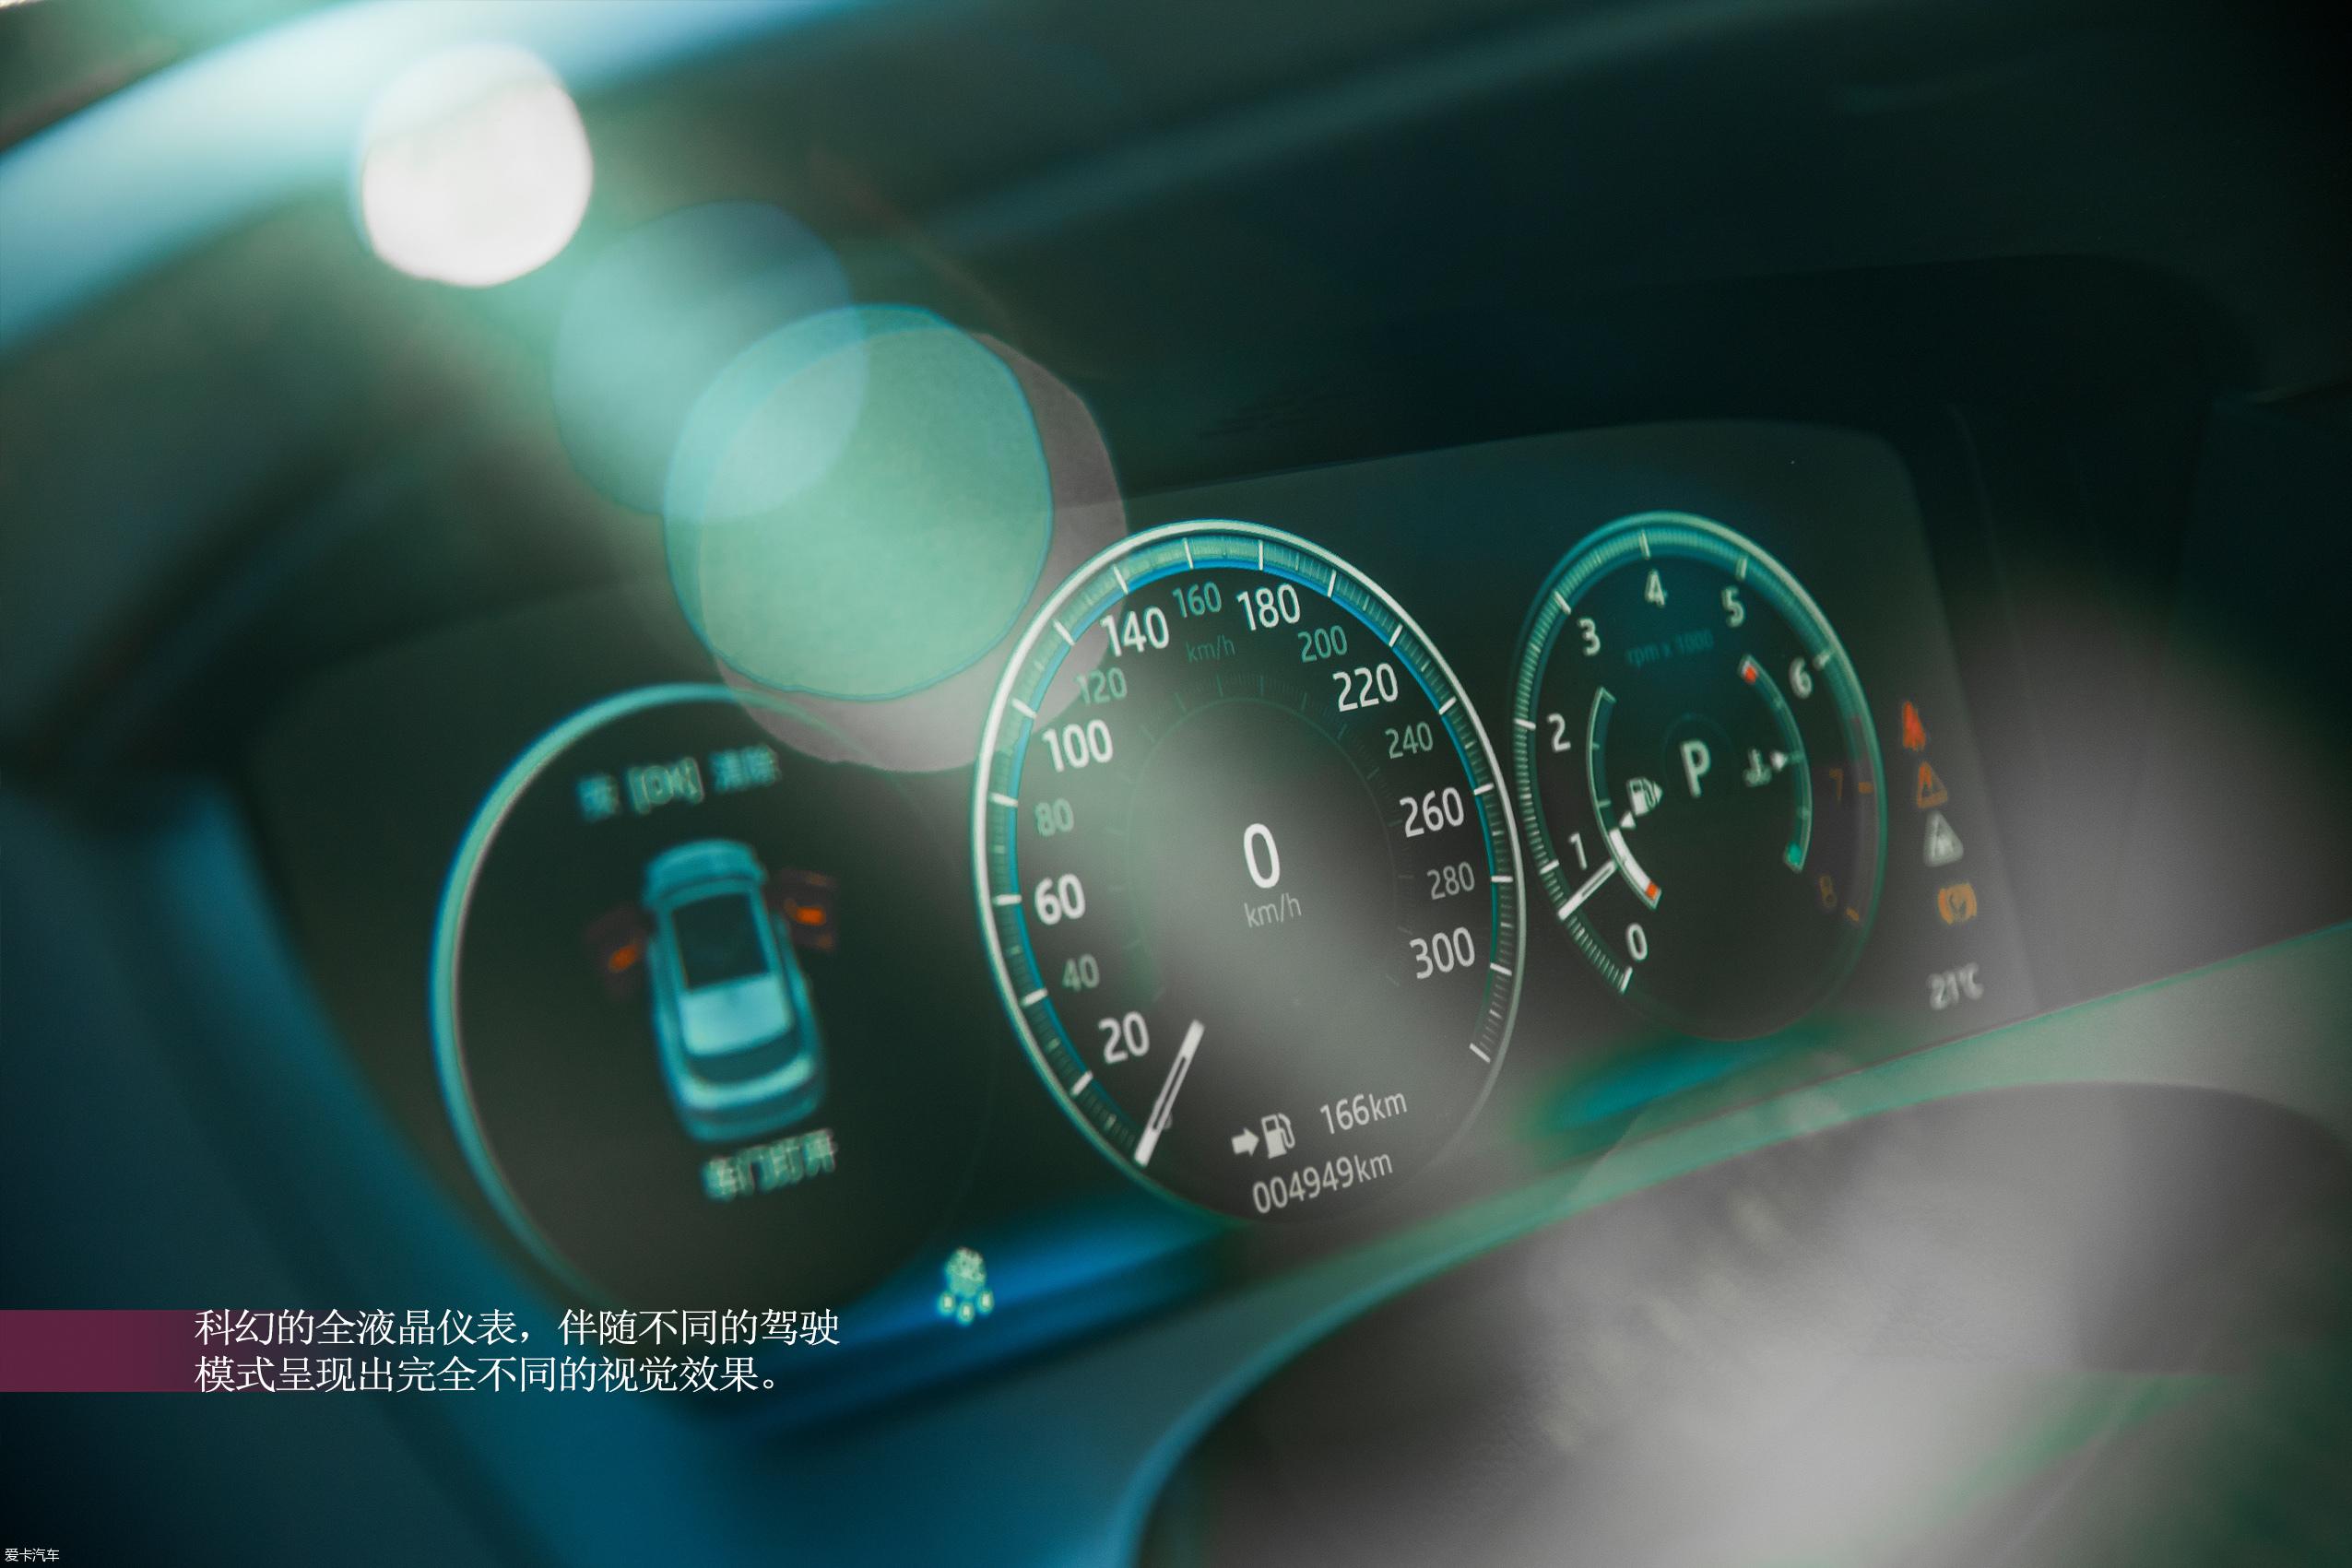 X View第四十三期 性能美豹 捷豹F-PACE23/27_爱卡汽车网